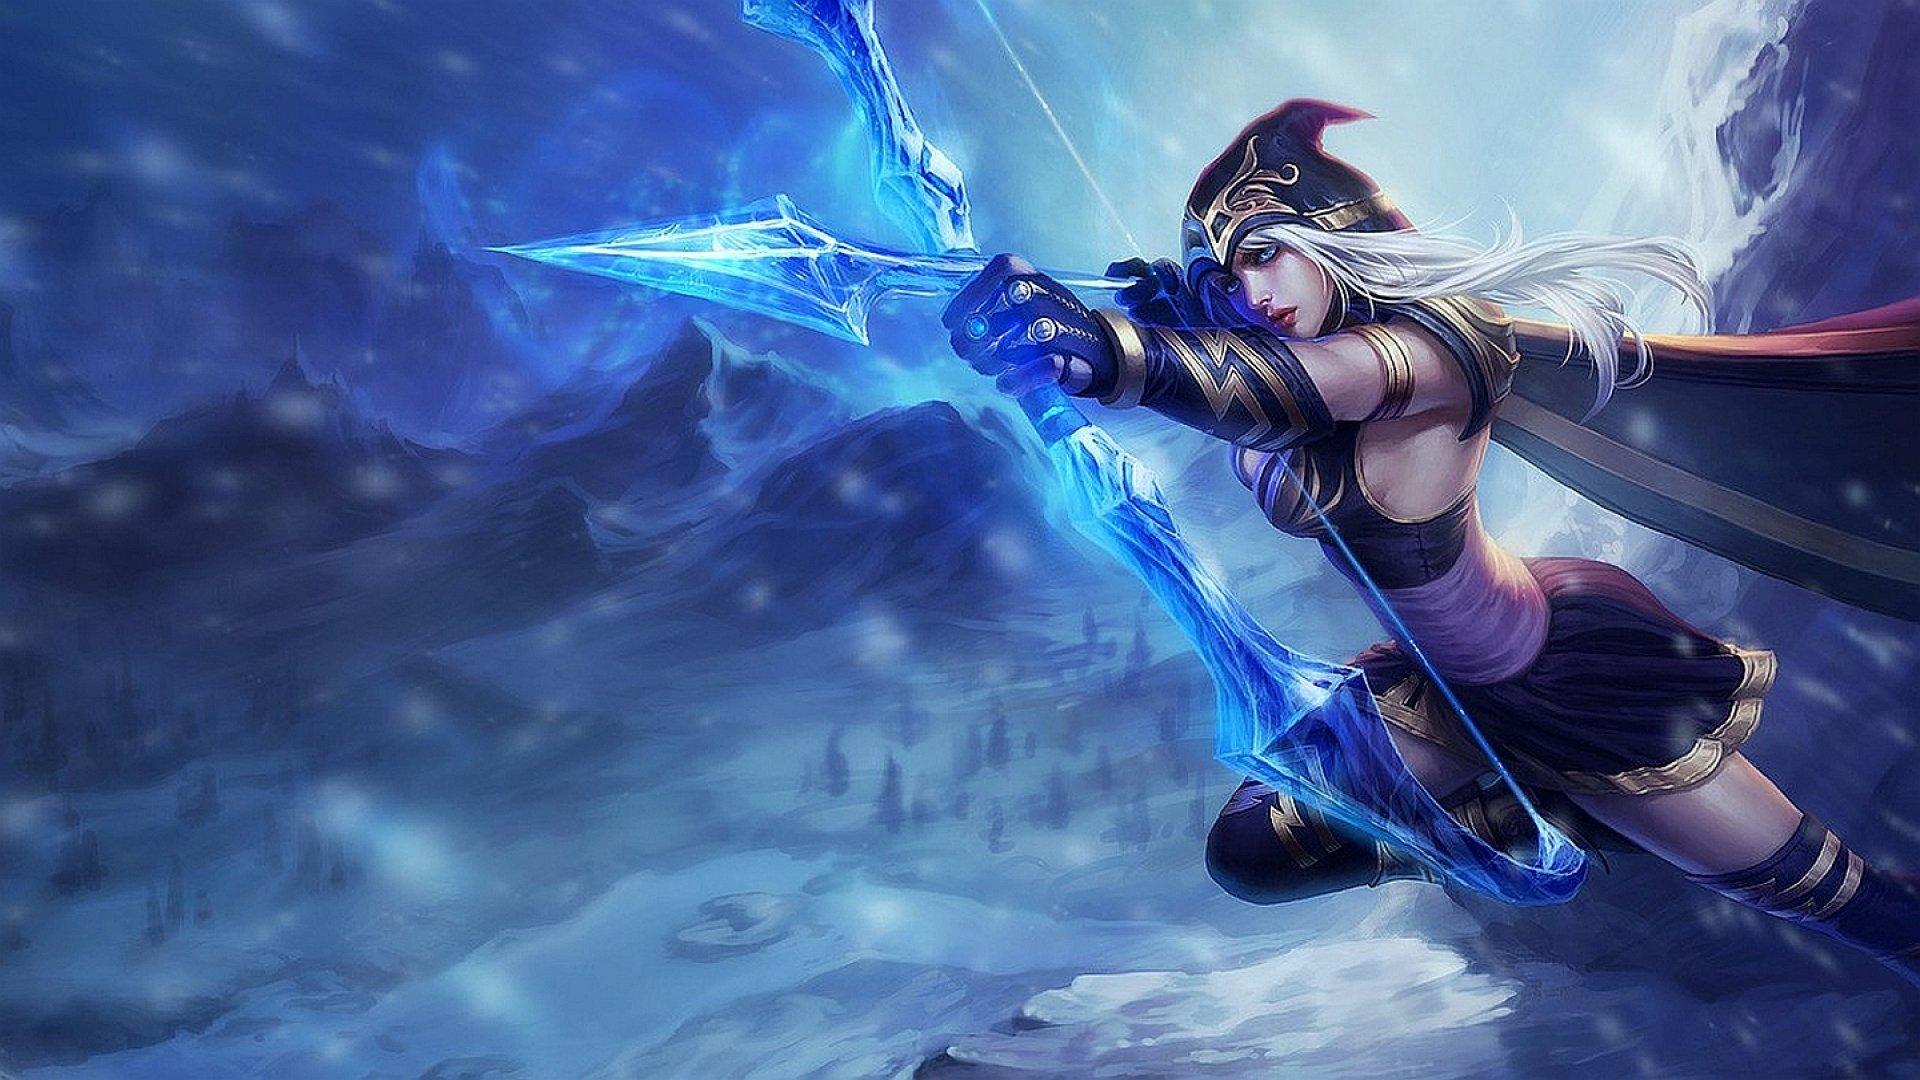 1280x960 League of Legends Archer 1280x960 Resolution